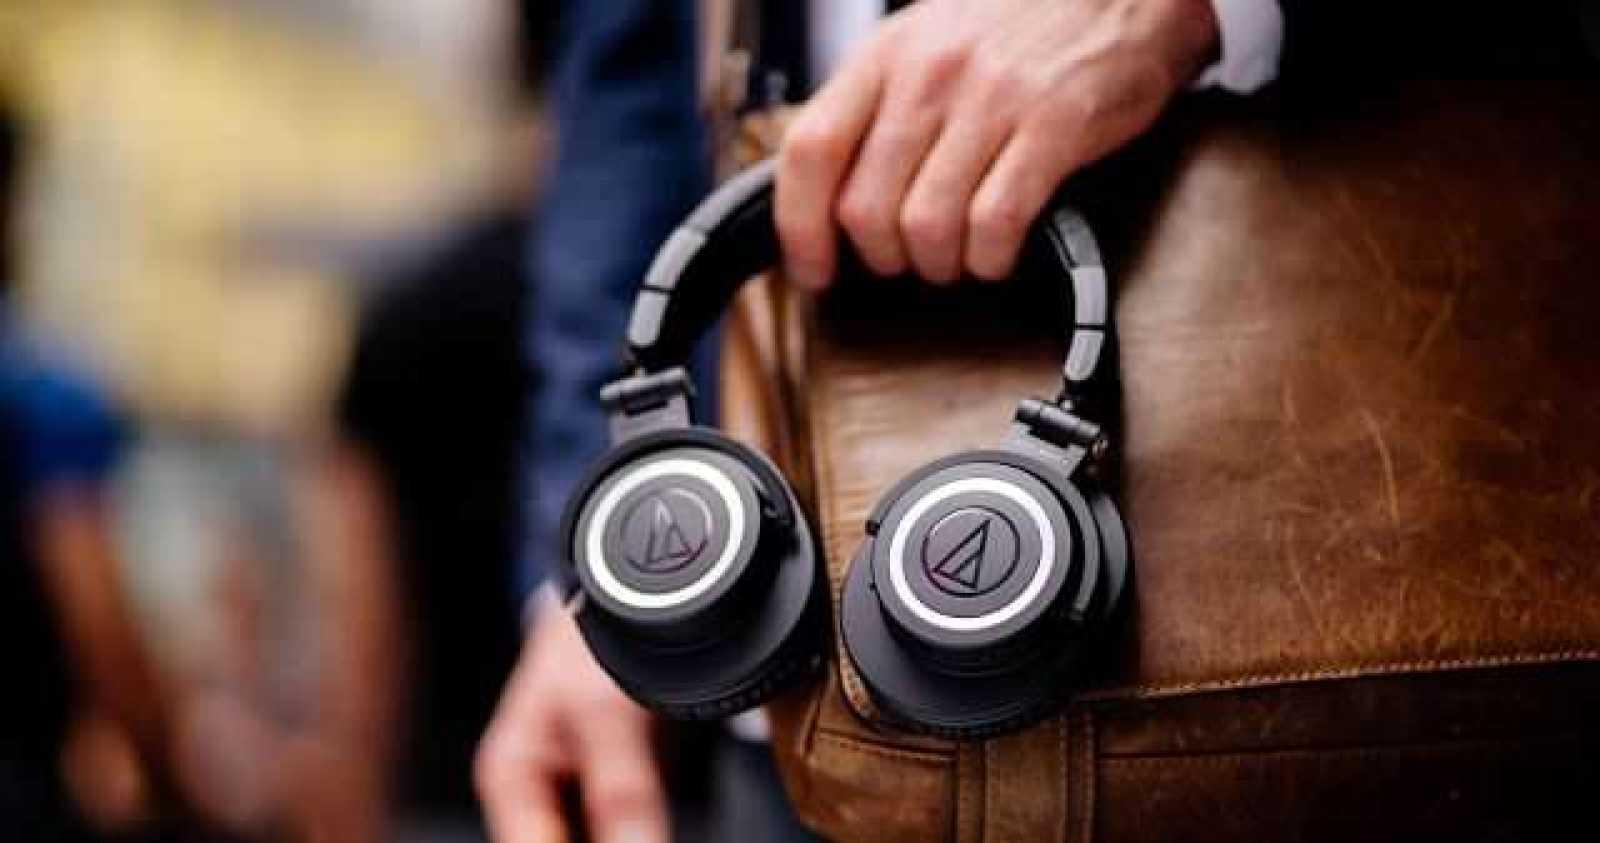 - ATH M50xBT lifestyle 62 2 - Audio Technica นำหูฟังรุ่นยอดนิยม ATH-M50x มาทำใหม่ในรูปแบบไร้สาย เตรียมวางจำหน่ายในไทยราคา 7,690 บาท